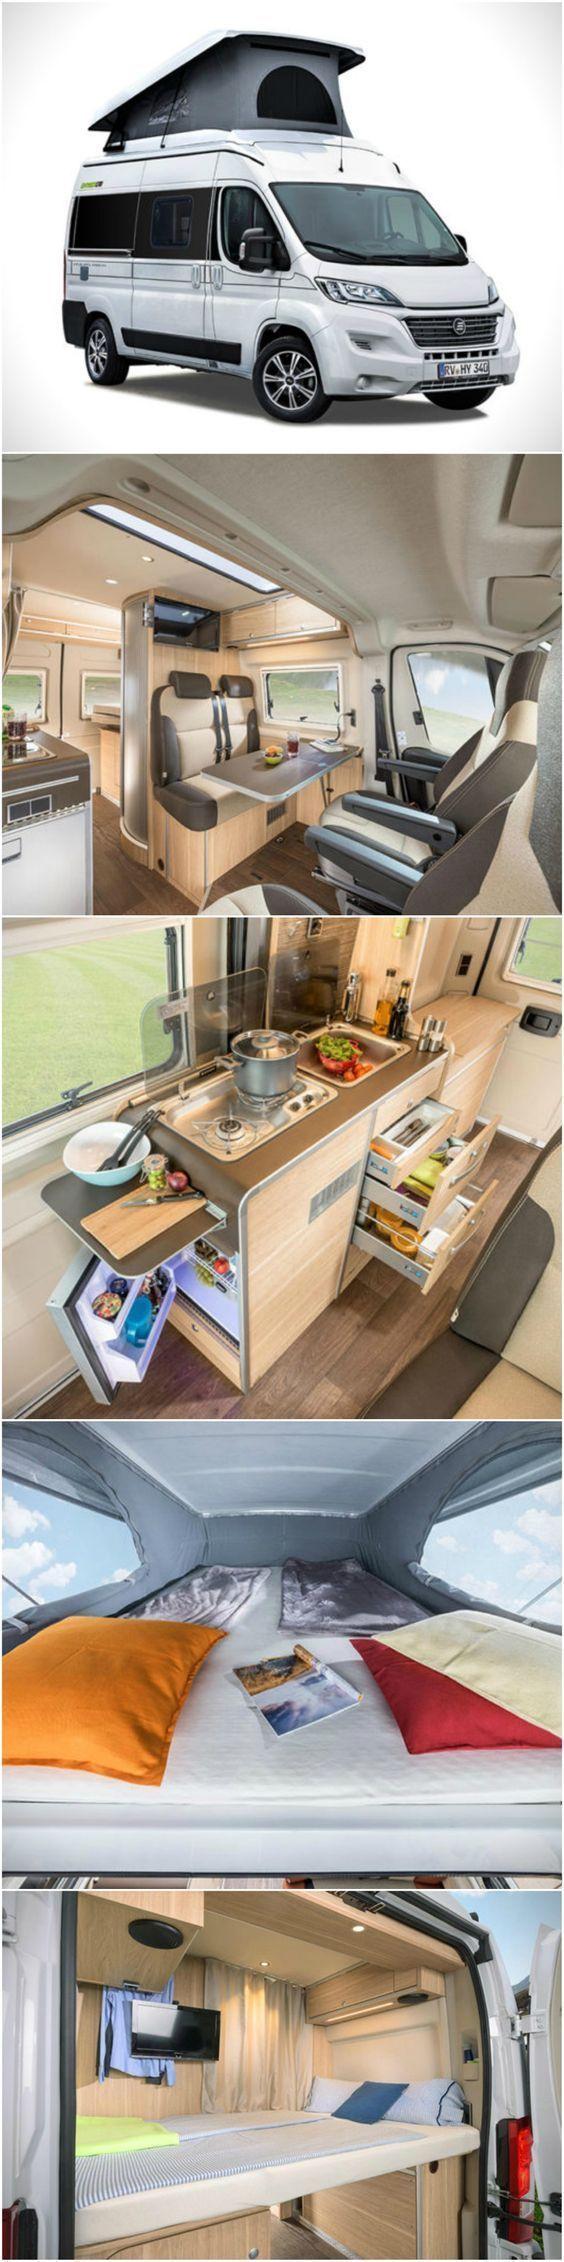 Photo of Rock Adventure Van: Leisure vehicle with bathroom